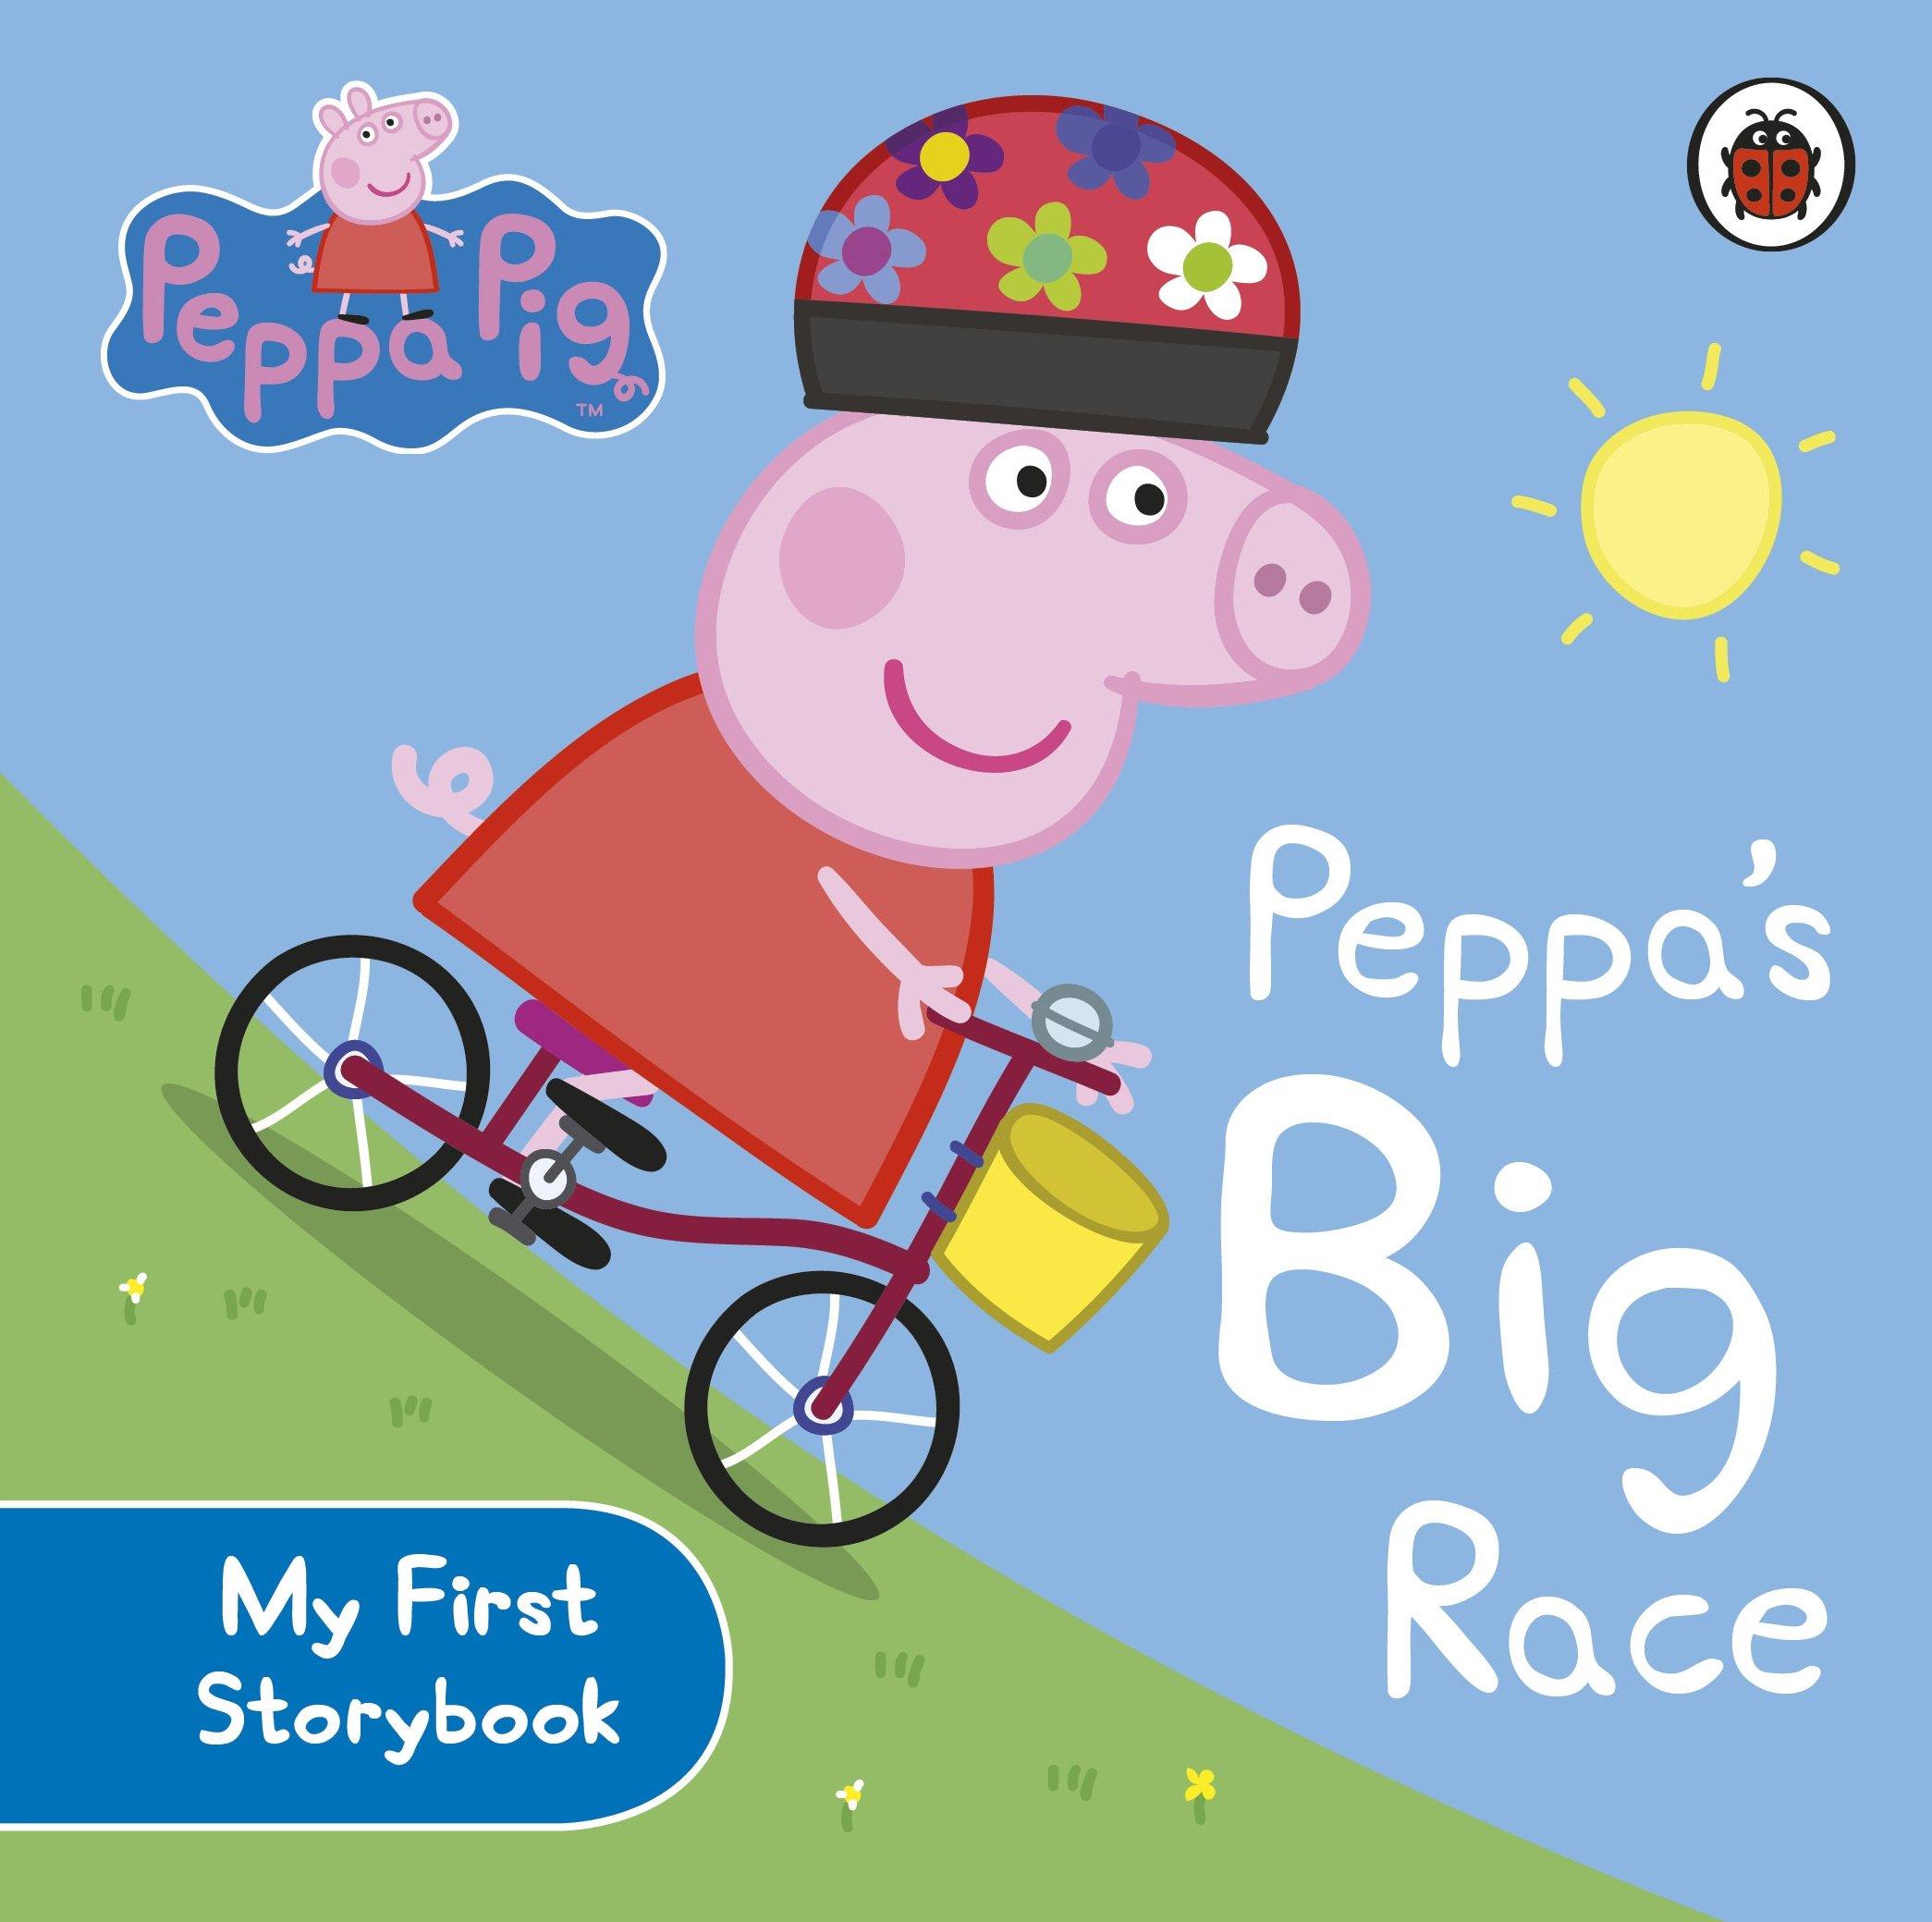 Peppa Pig Peppa S Big Race Amazon Co Uk Peppa Pig 9780723288589